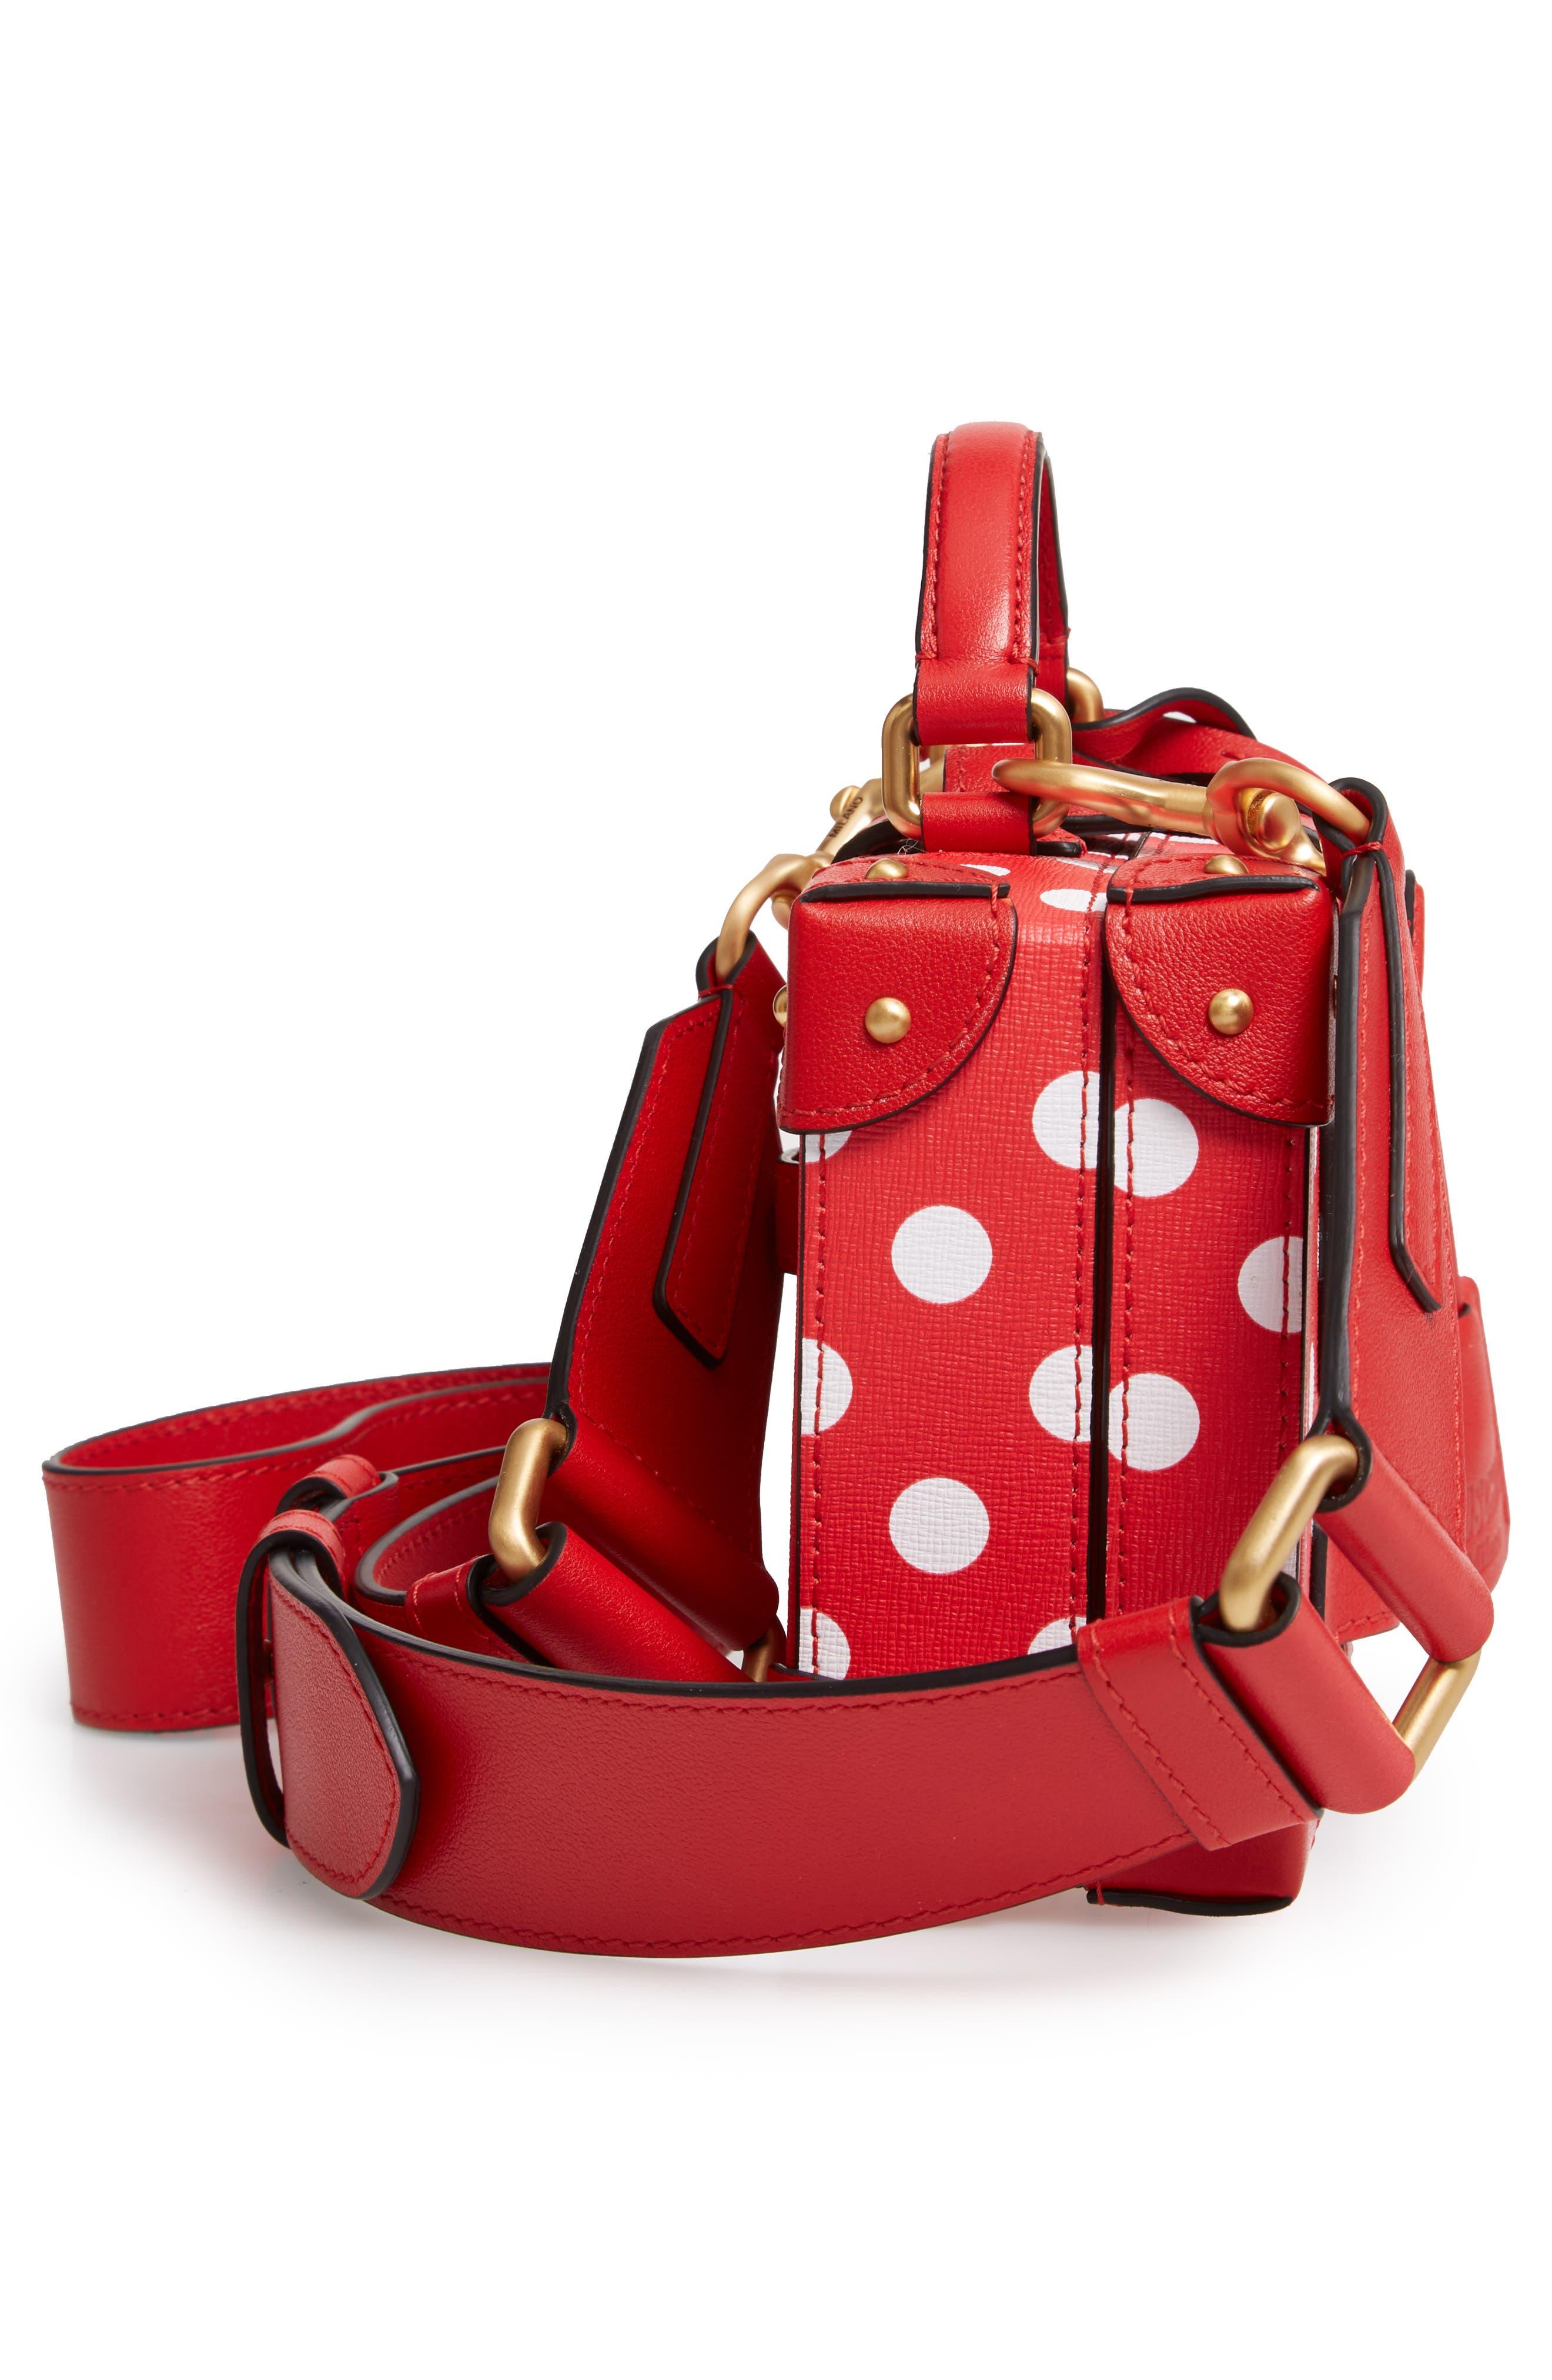 MOSCHINO, Polka Dot Box Leather Crossbody Bag, Alternate thumbnail 5, color, RED